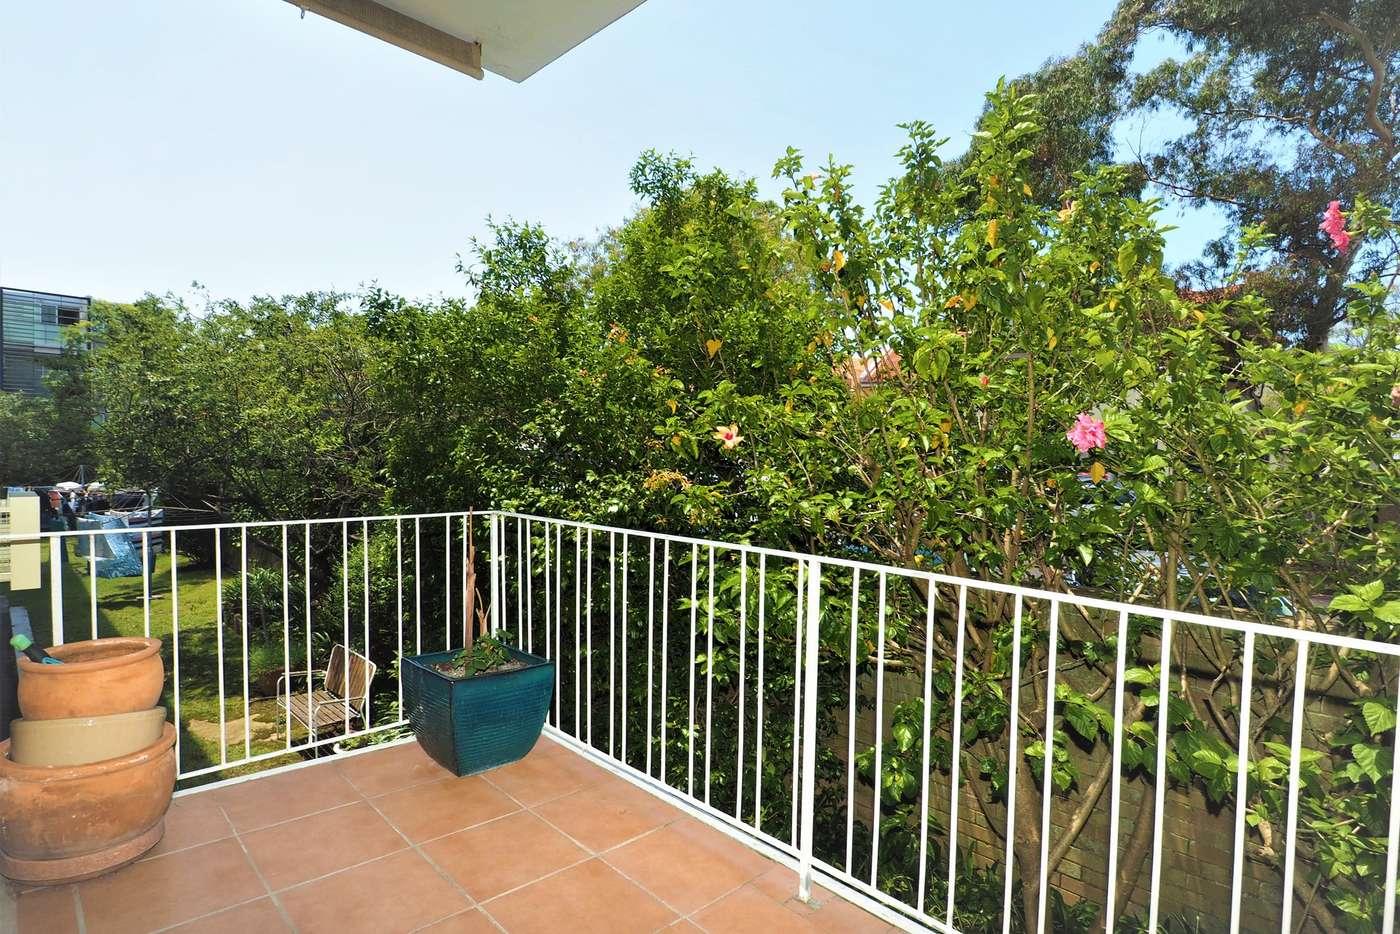 Main view of Homely apartment listing, 3/186 Raglan Street, Mosman NSW 2088